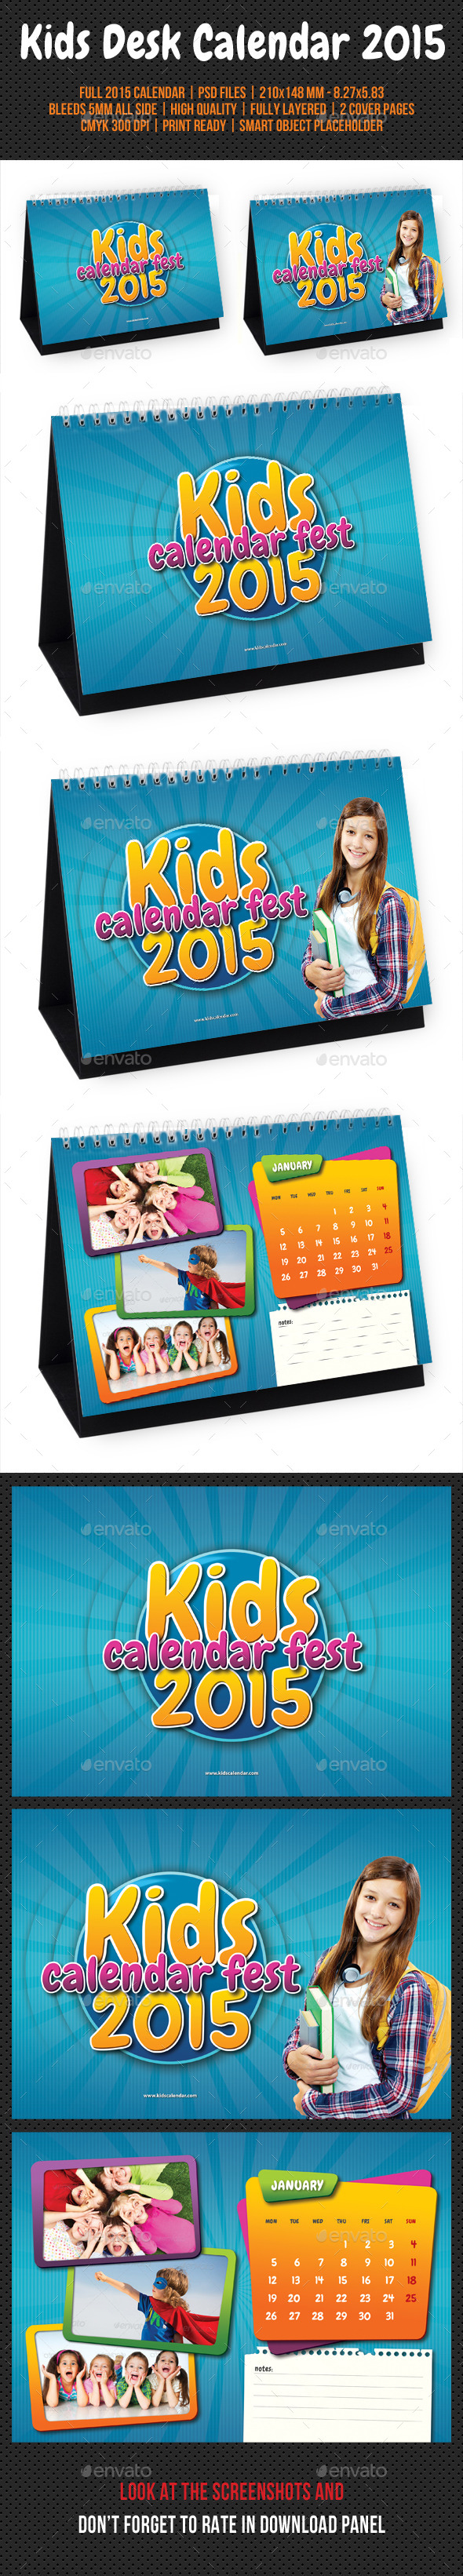 GraphicRiver Kids Desk Calendar 2015 9701399